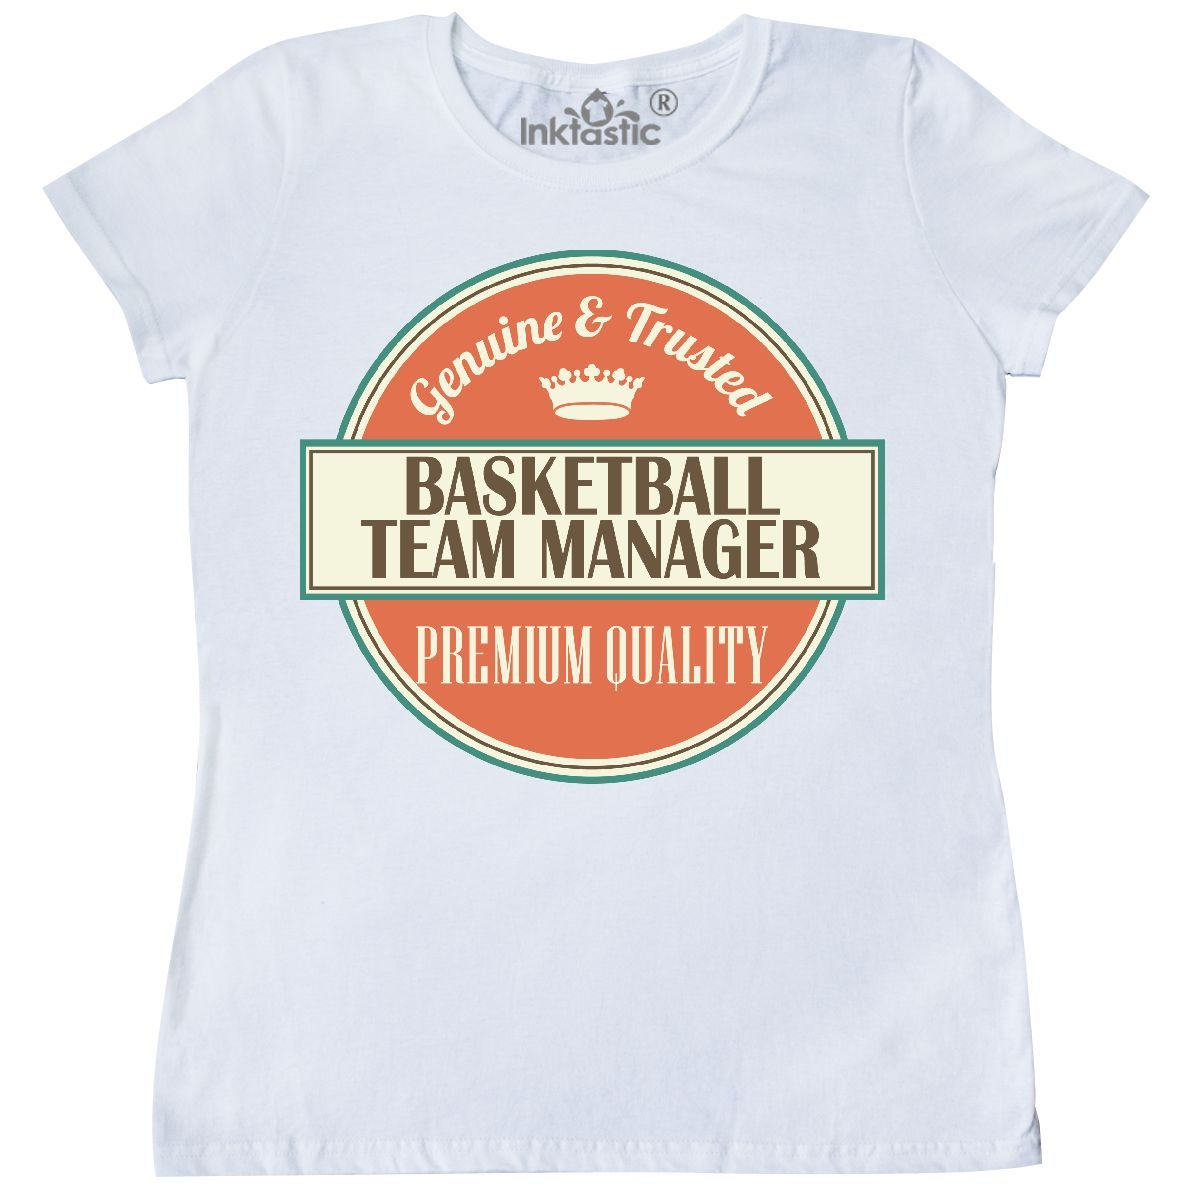 6e65f25c7 Inktastic Basketball Team Manager Funny Gift Idea Women's T-Shirt ...